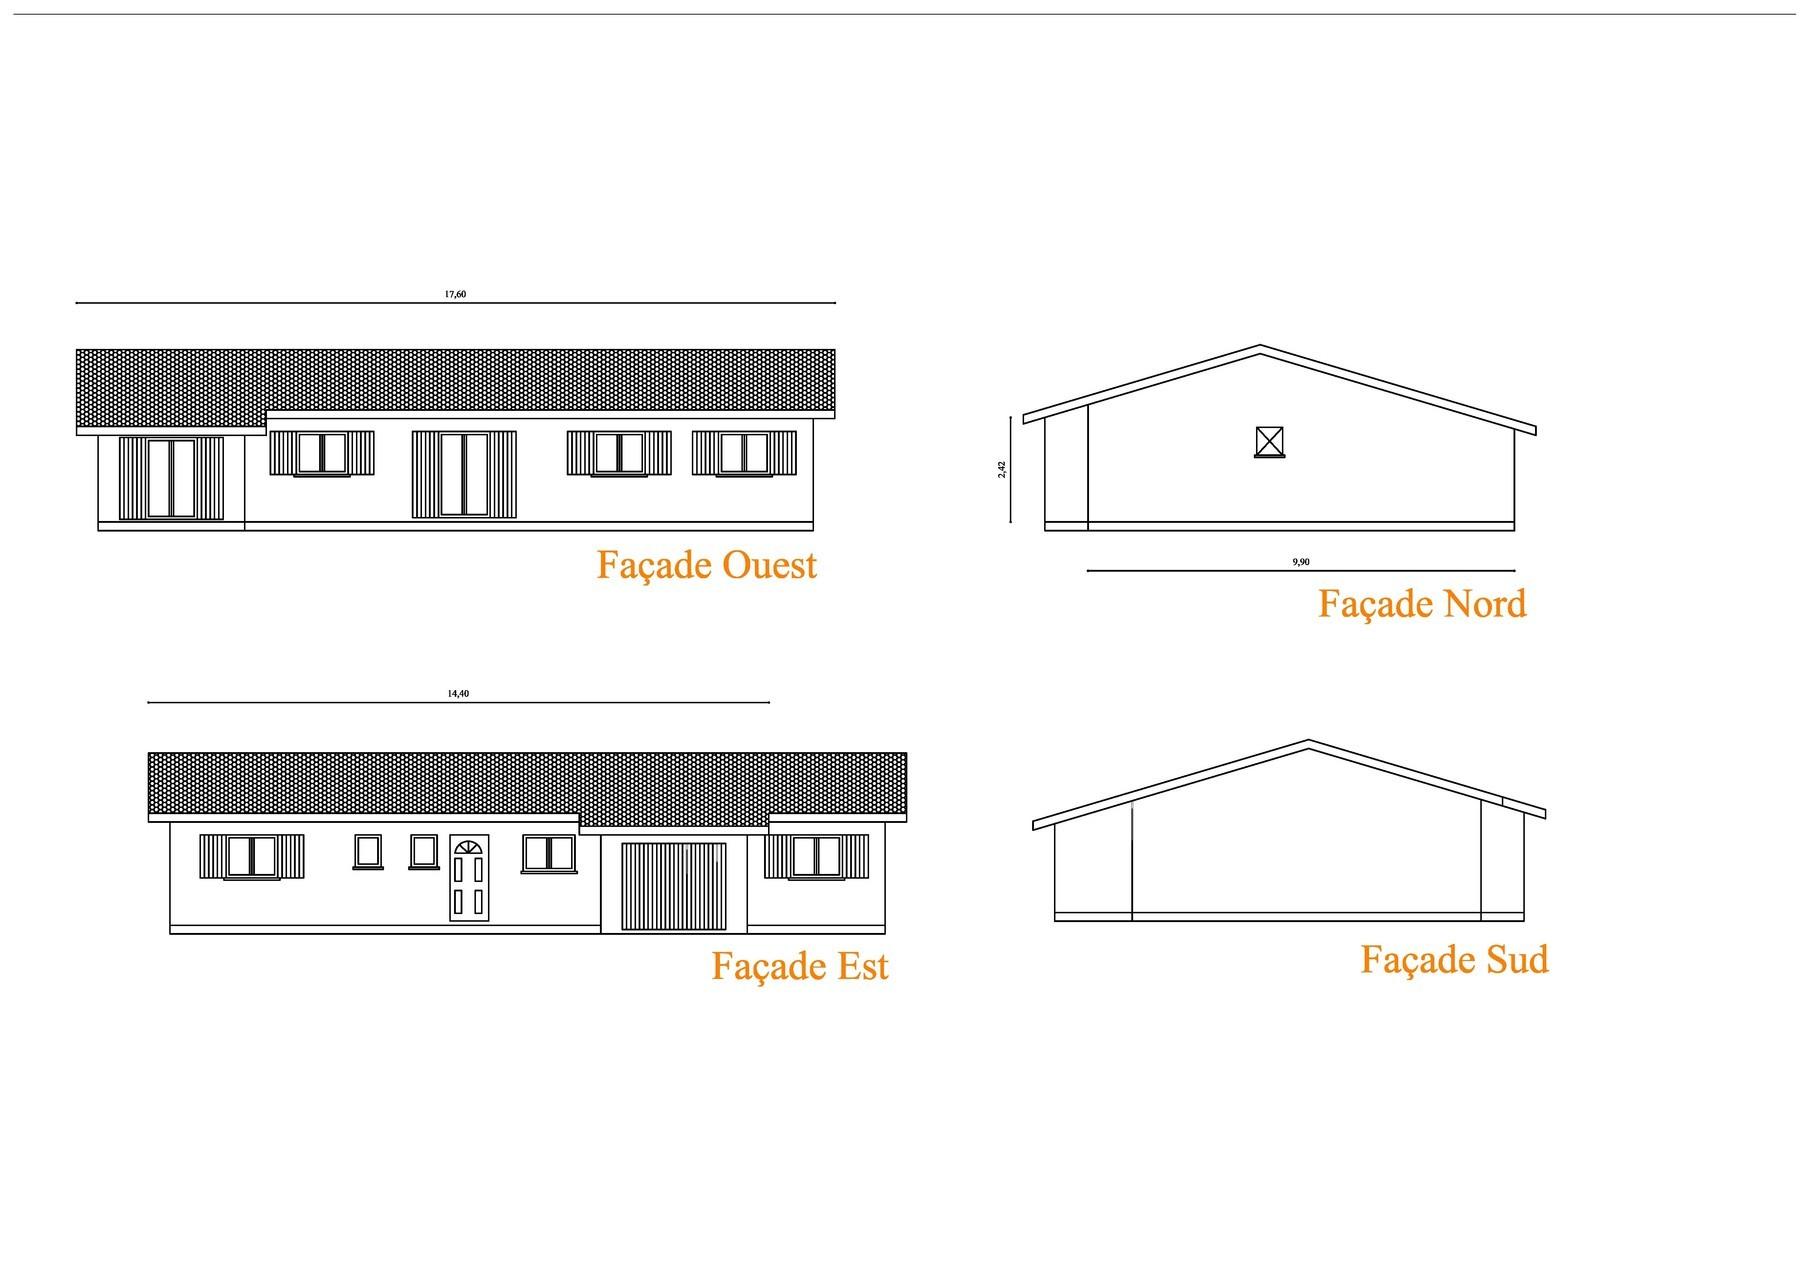 Extension maison permis de construire construire for Demande de prorogation de permis de construire